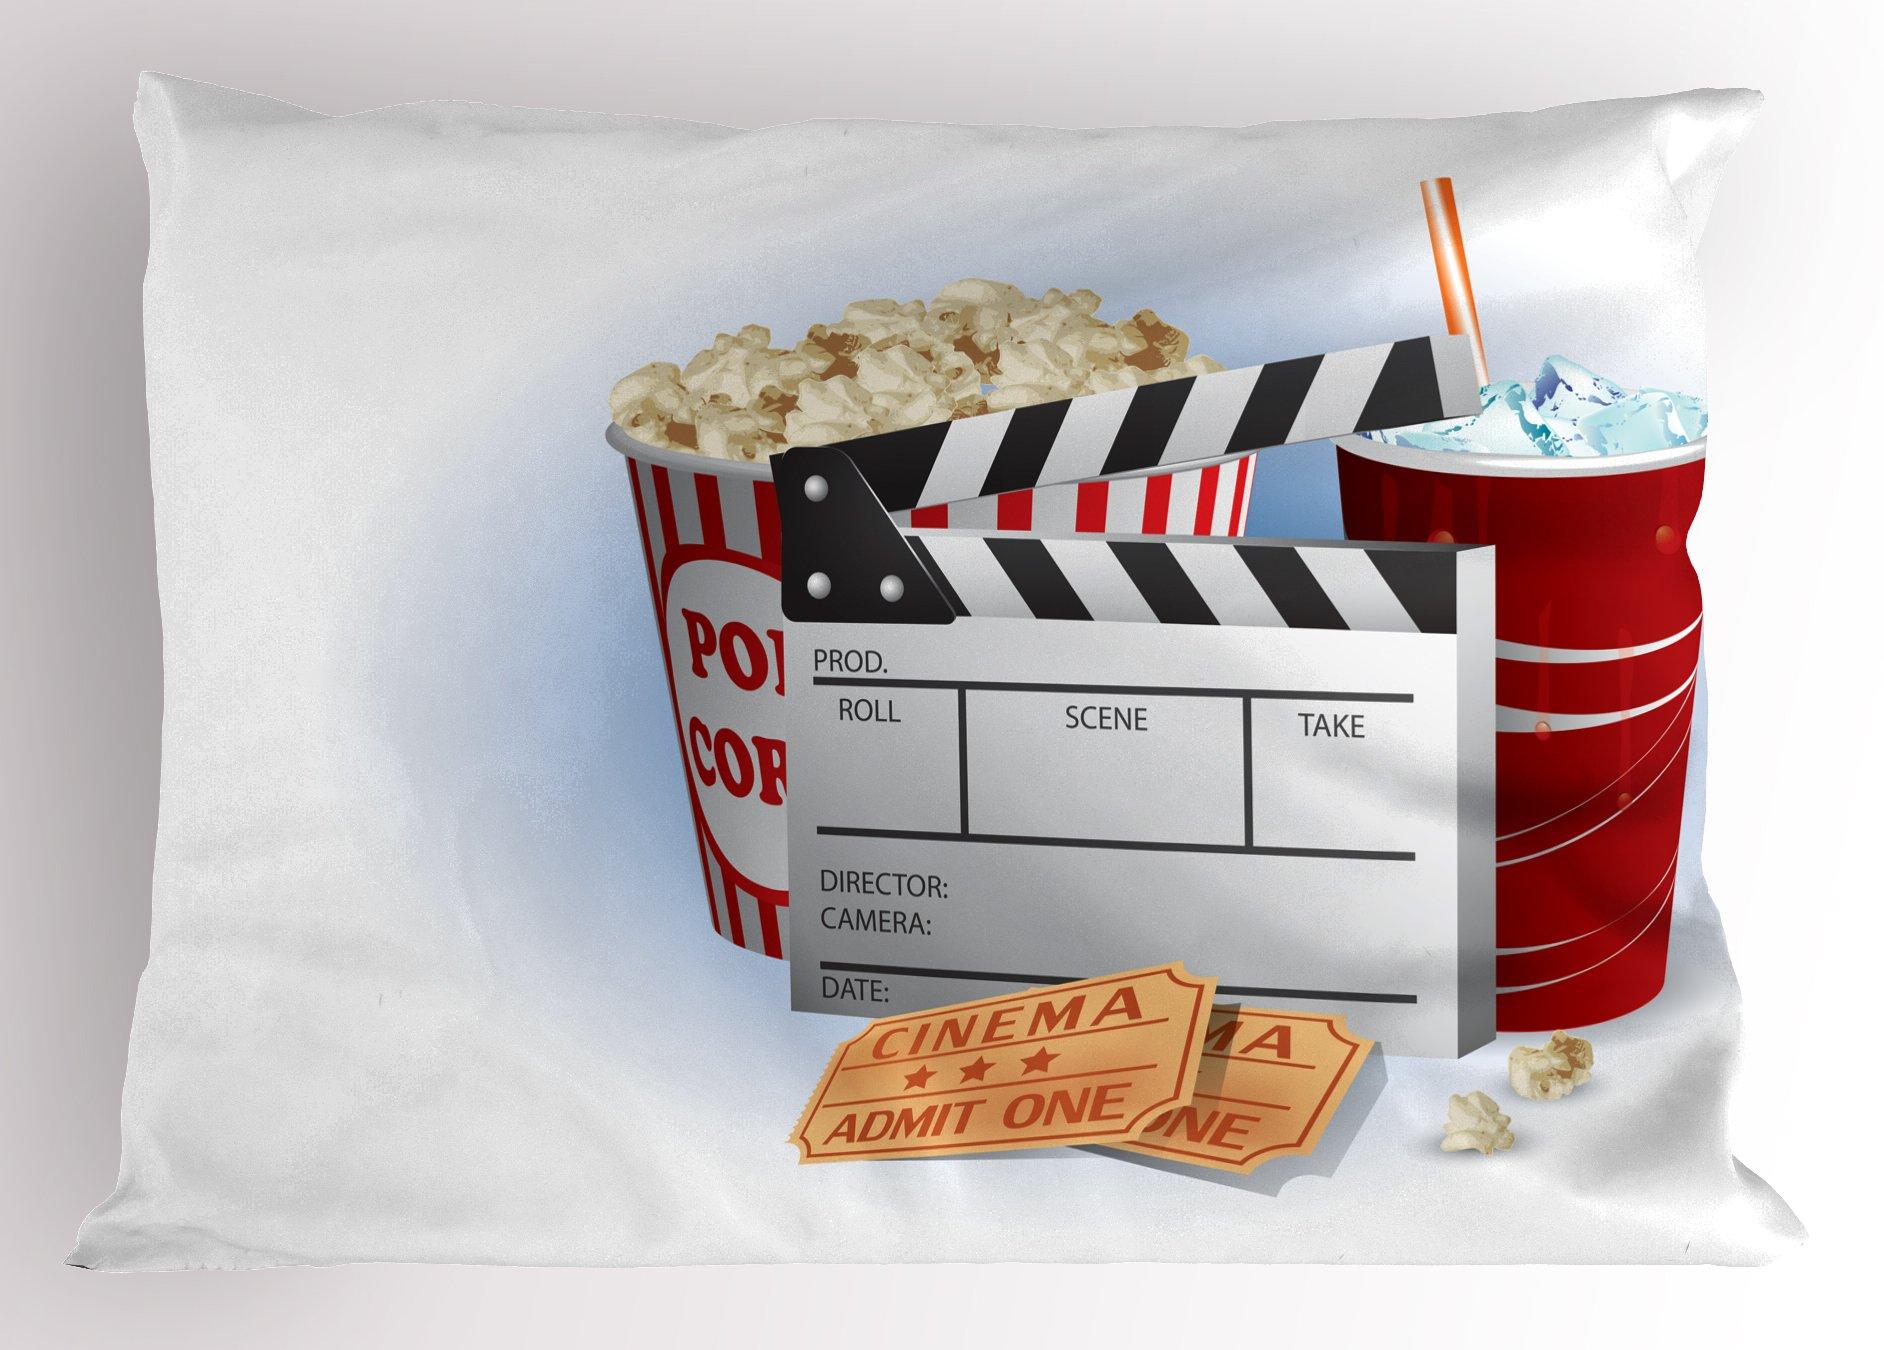 Ambesonne Movie Theater Pillow Sham, Soda Tickets Fresh Popcorn and Clapper Board Blockbuster Premiere Cinema, Decorative Standard Queen Size Printed Pillowcase, 30 X 20 Inches, Multicolor